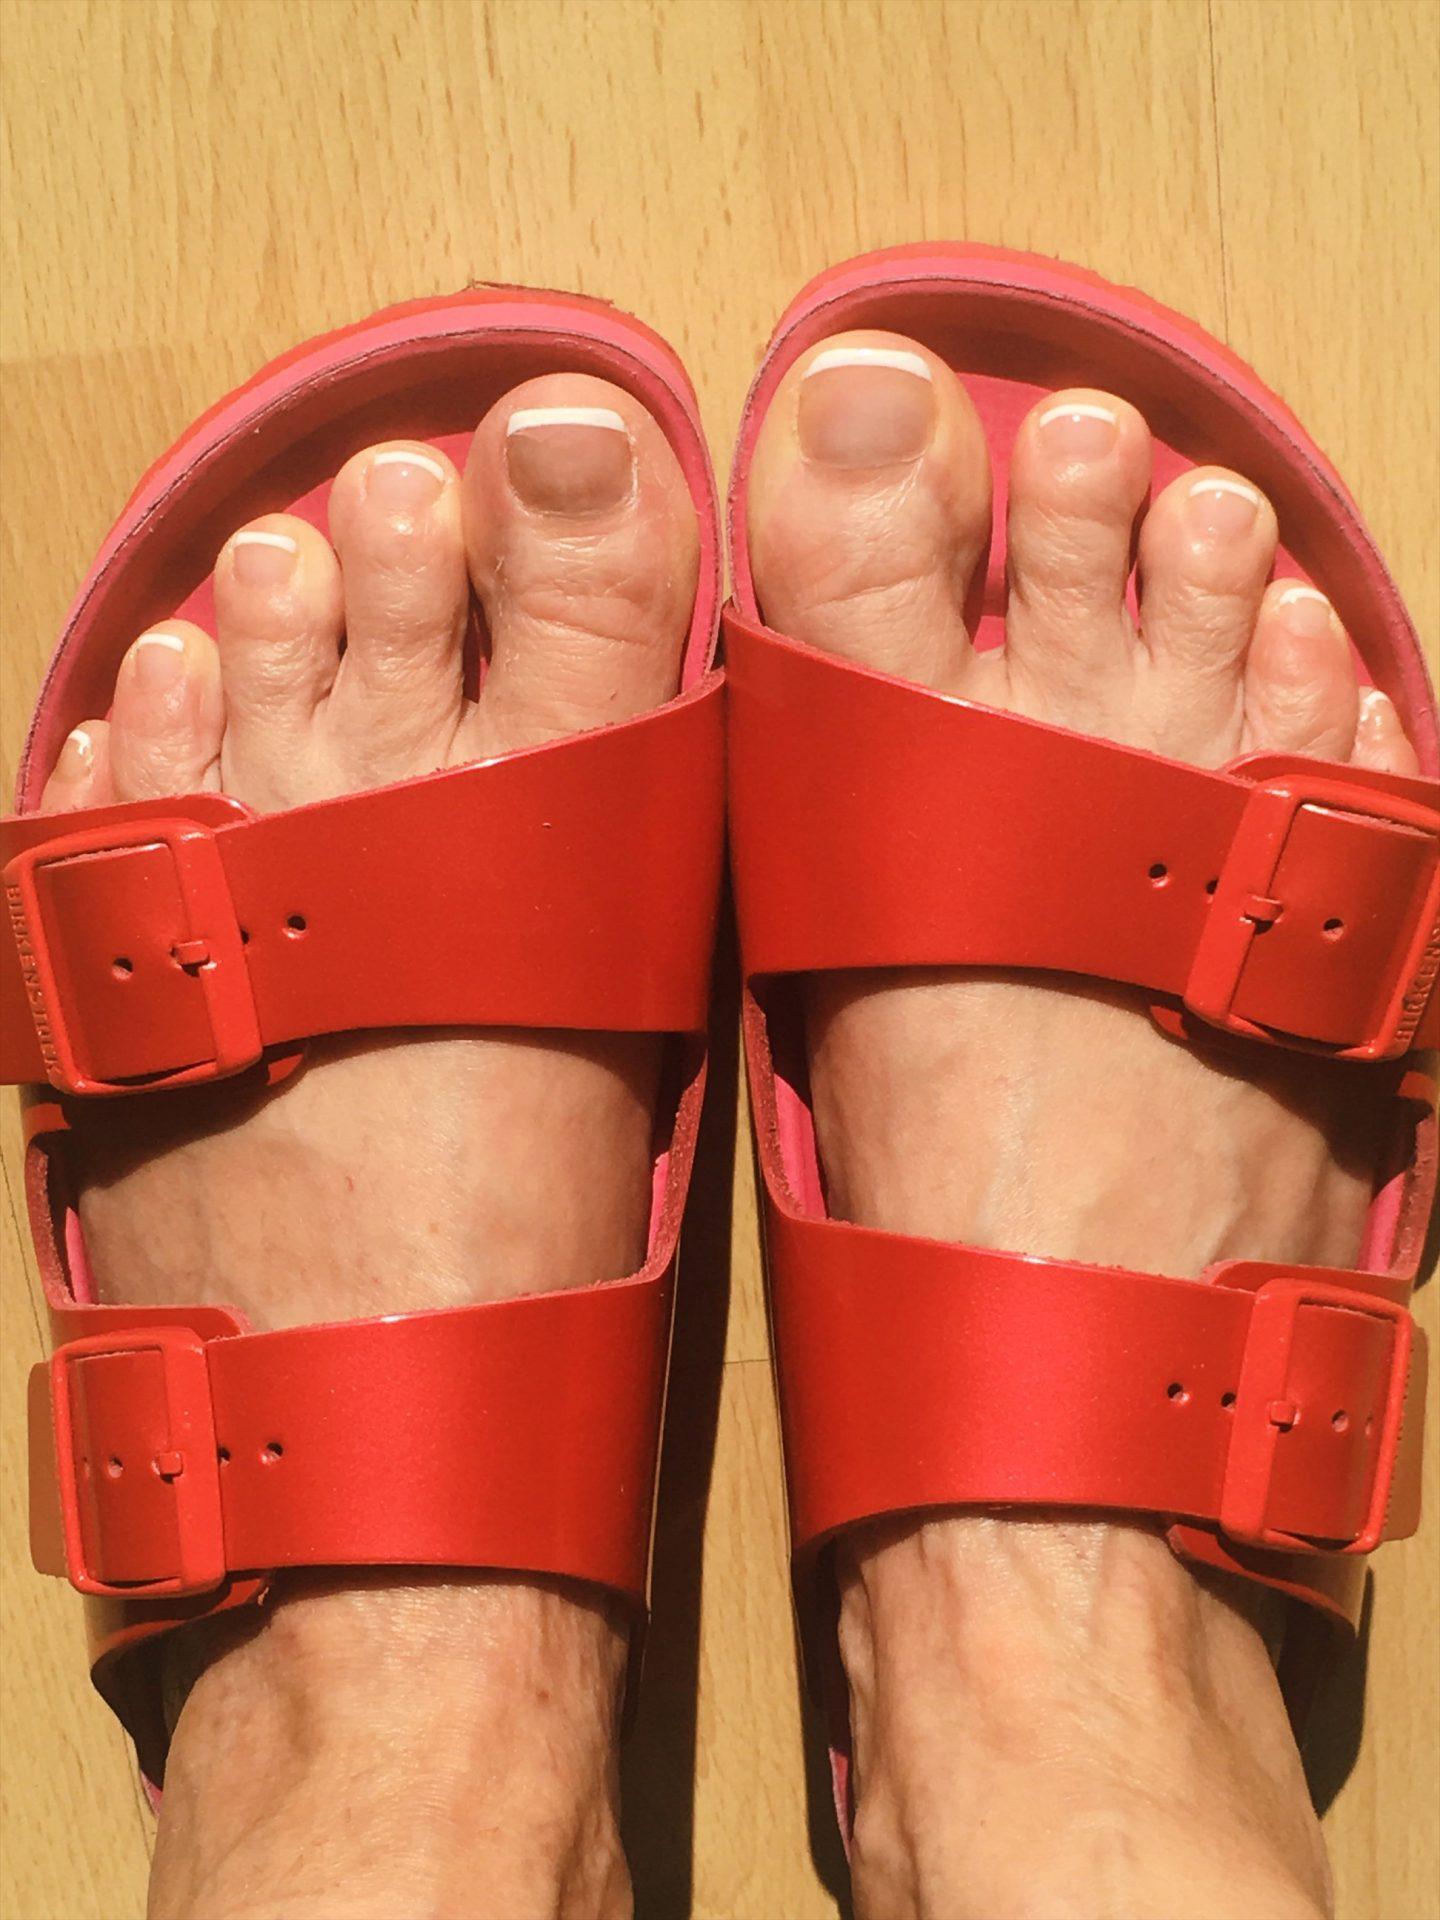 e026584c812b15 Sandalen  Crocs vs. Birkenstock - Glam up your Lifestyle